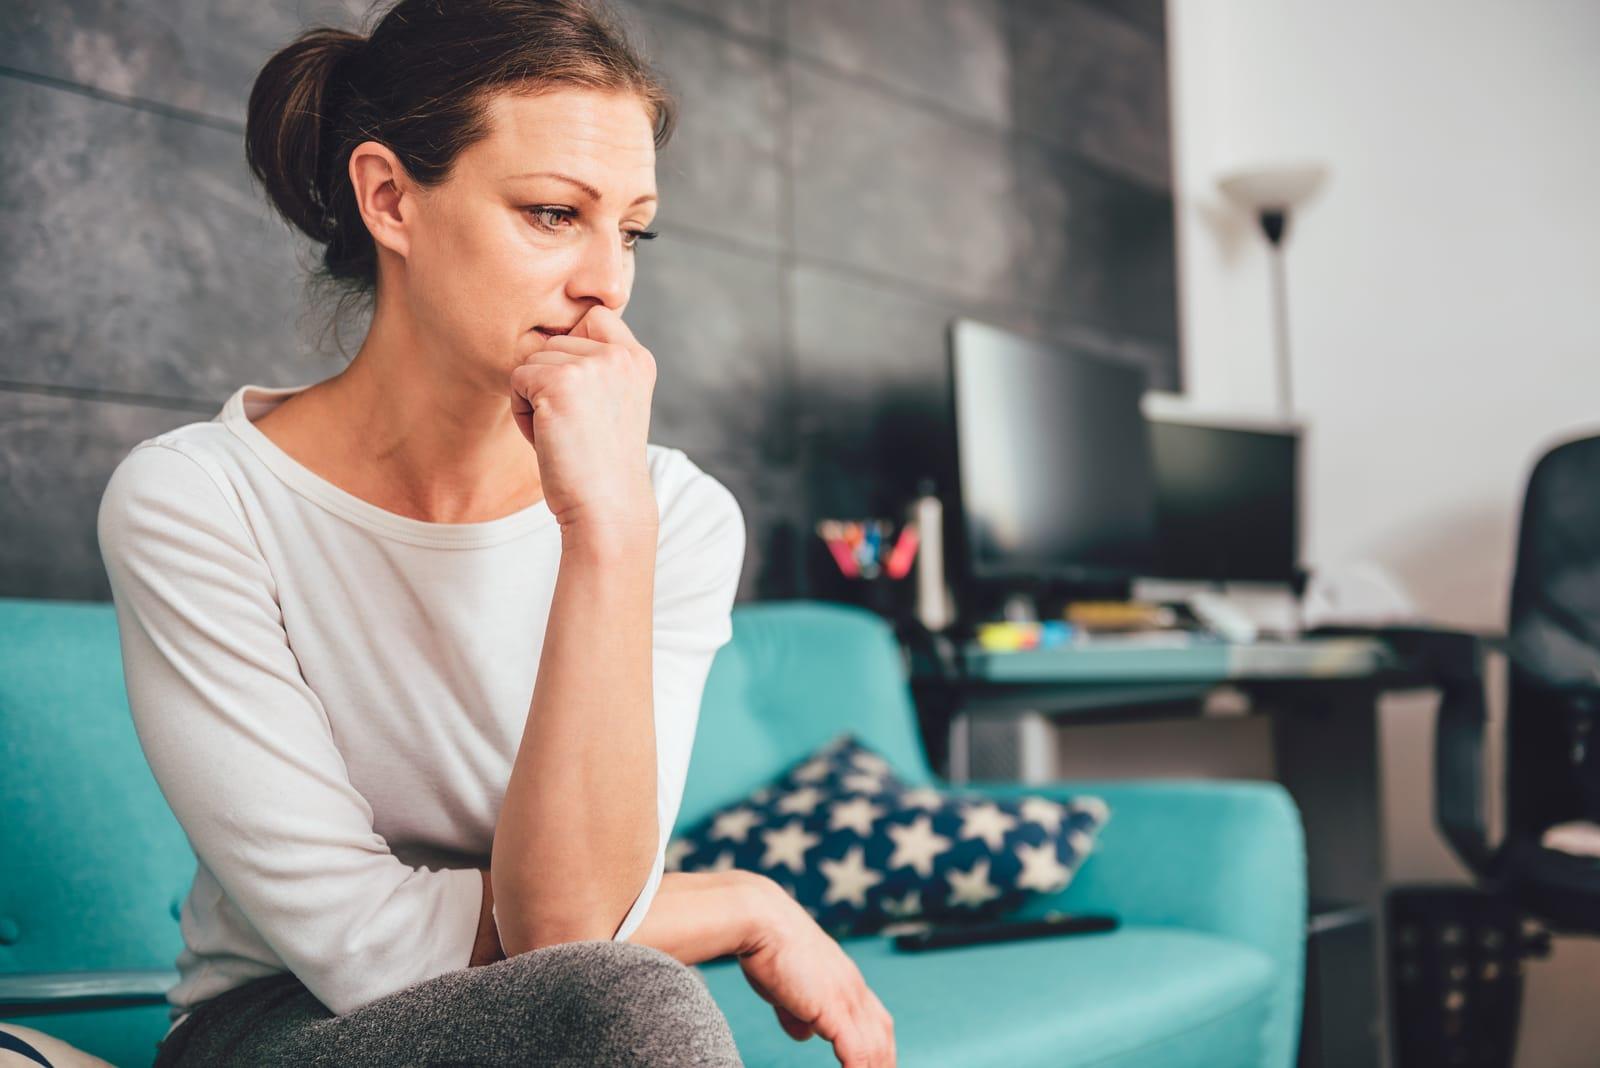 Sad woman sitting on a sofa